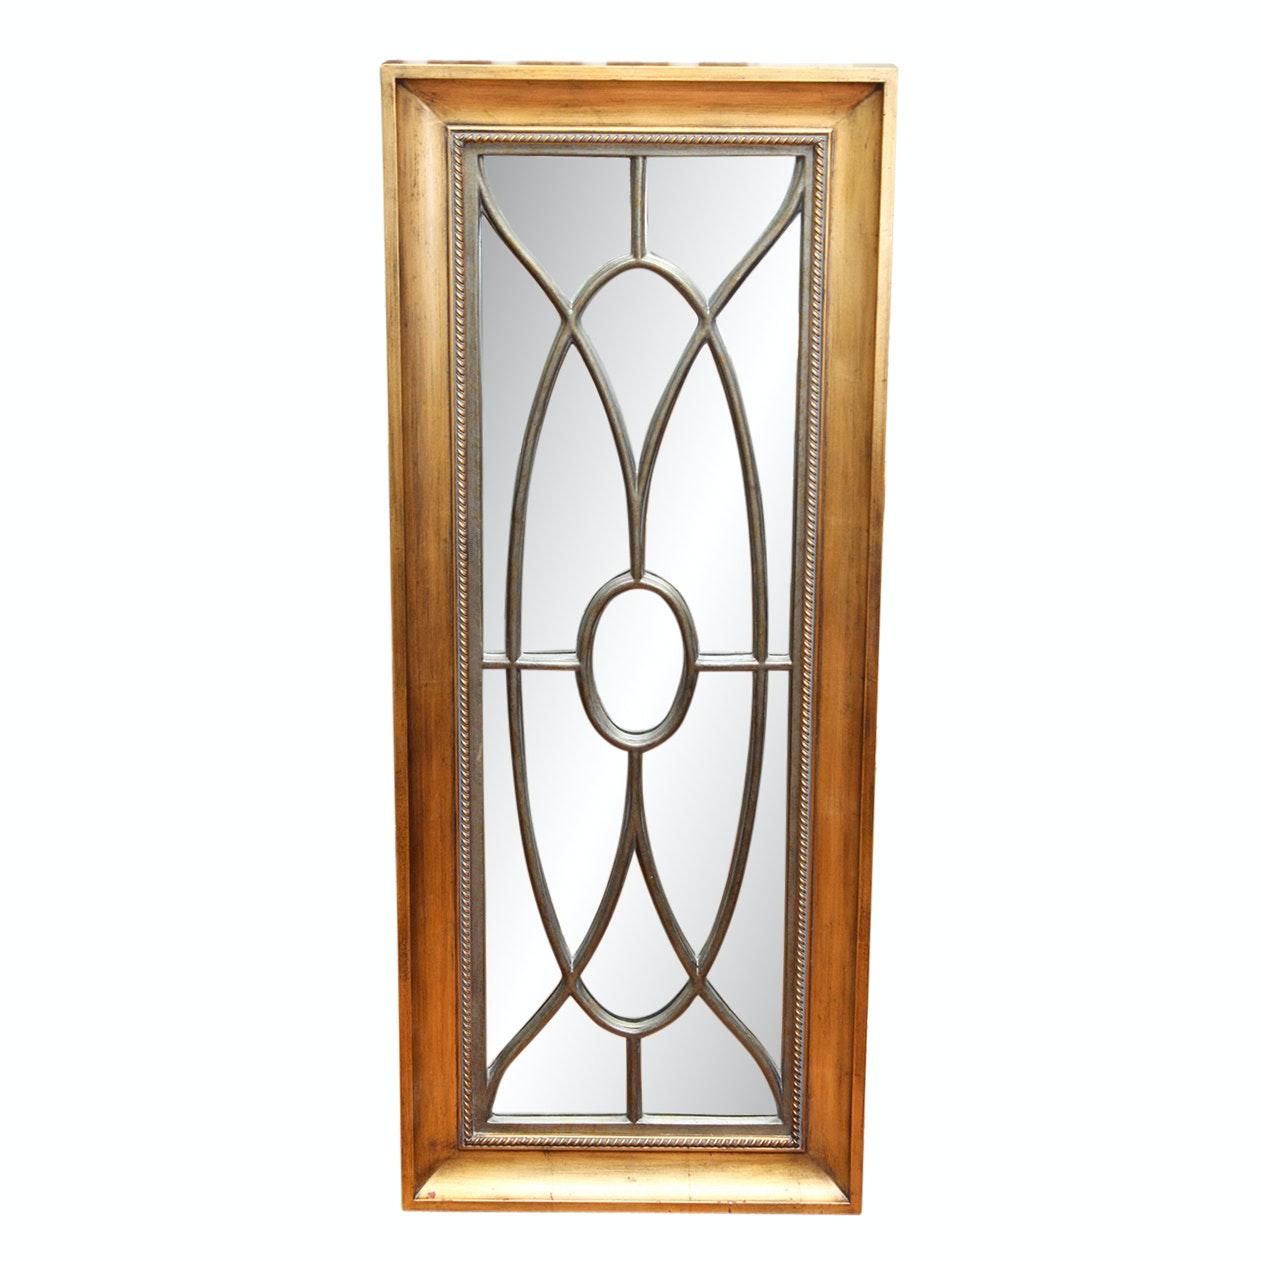 Three Framed Panel Wall Mirrors